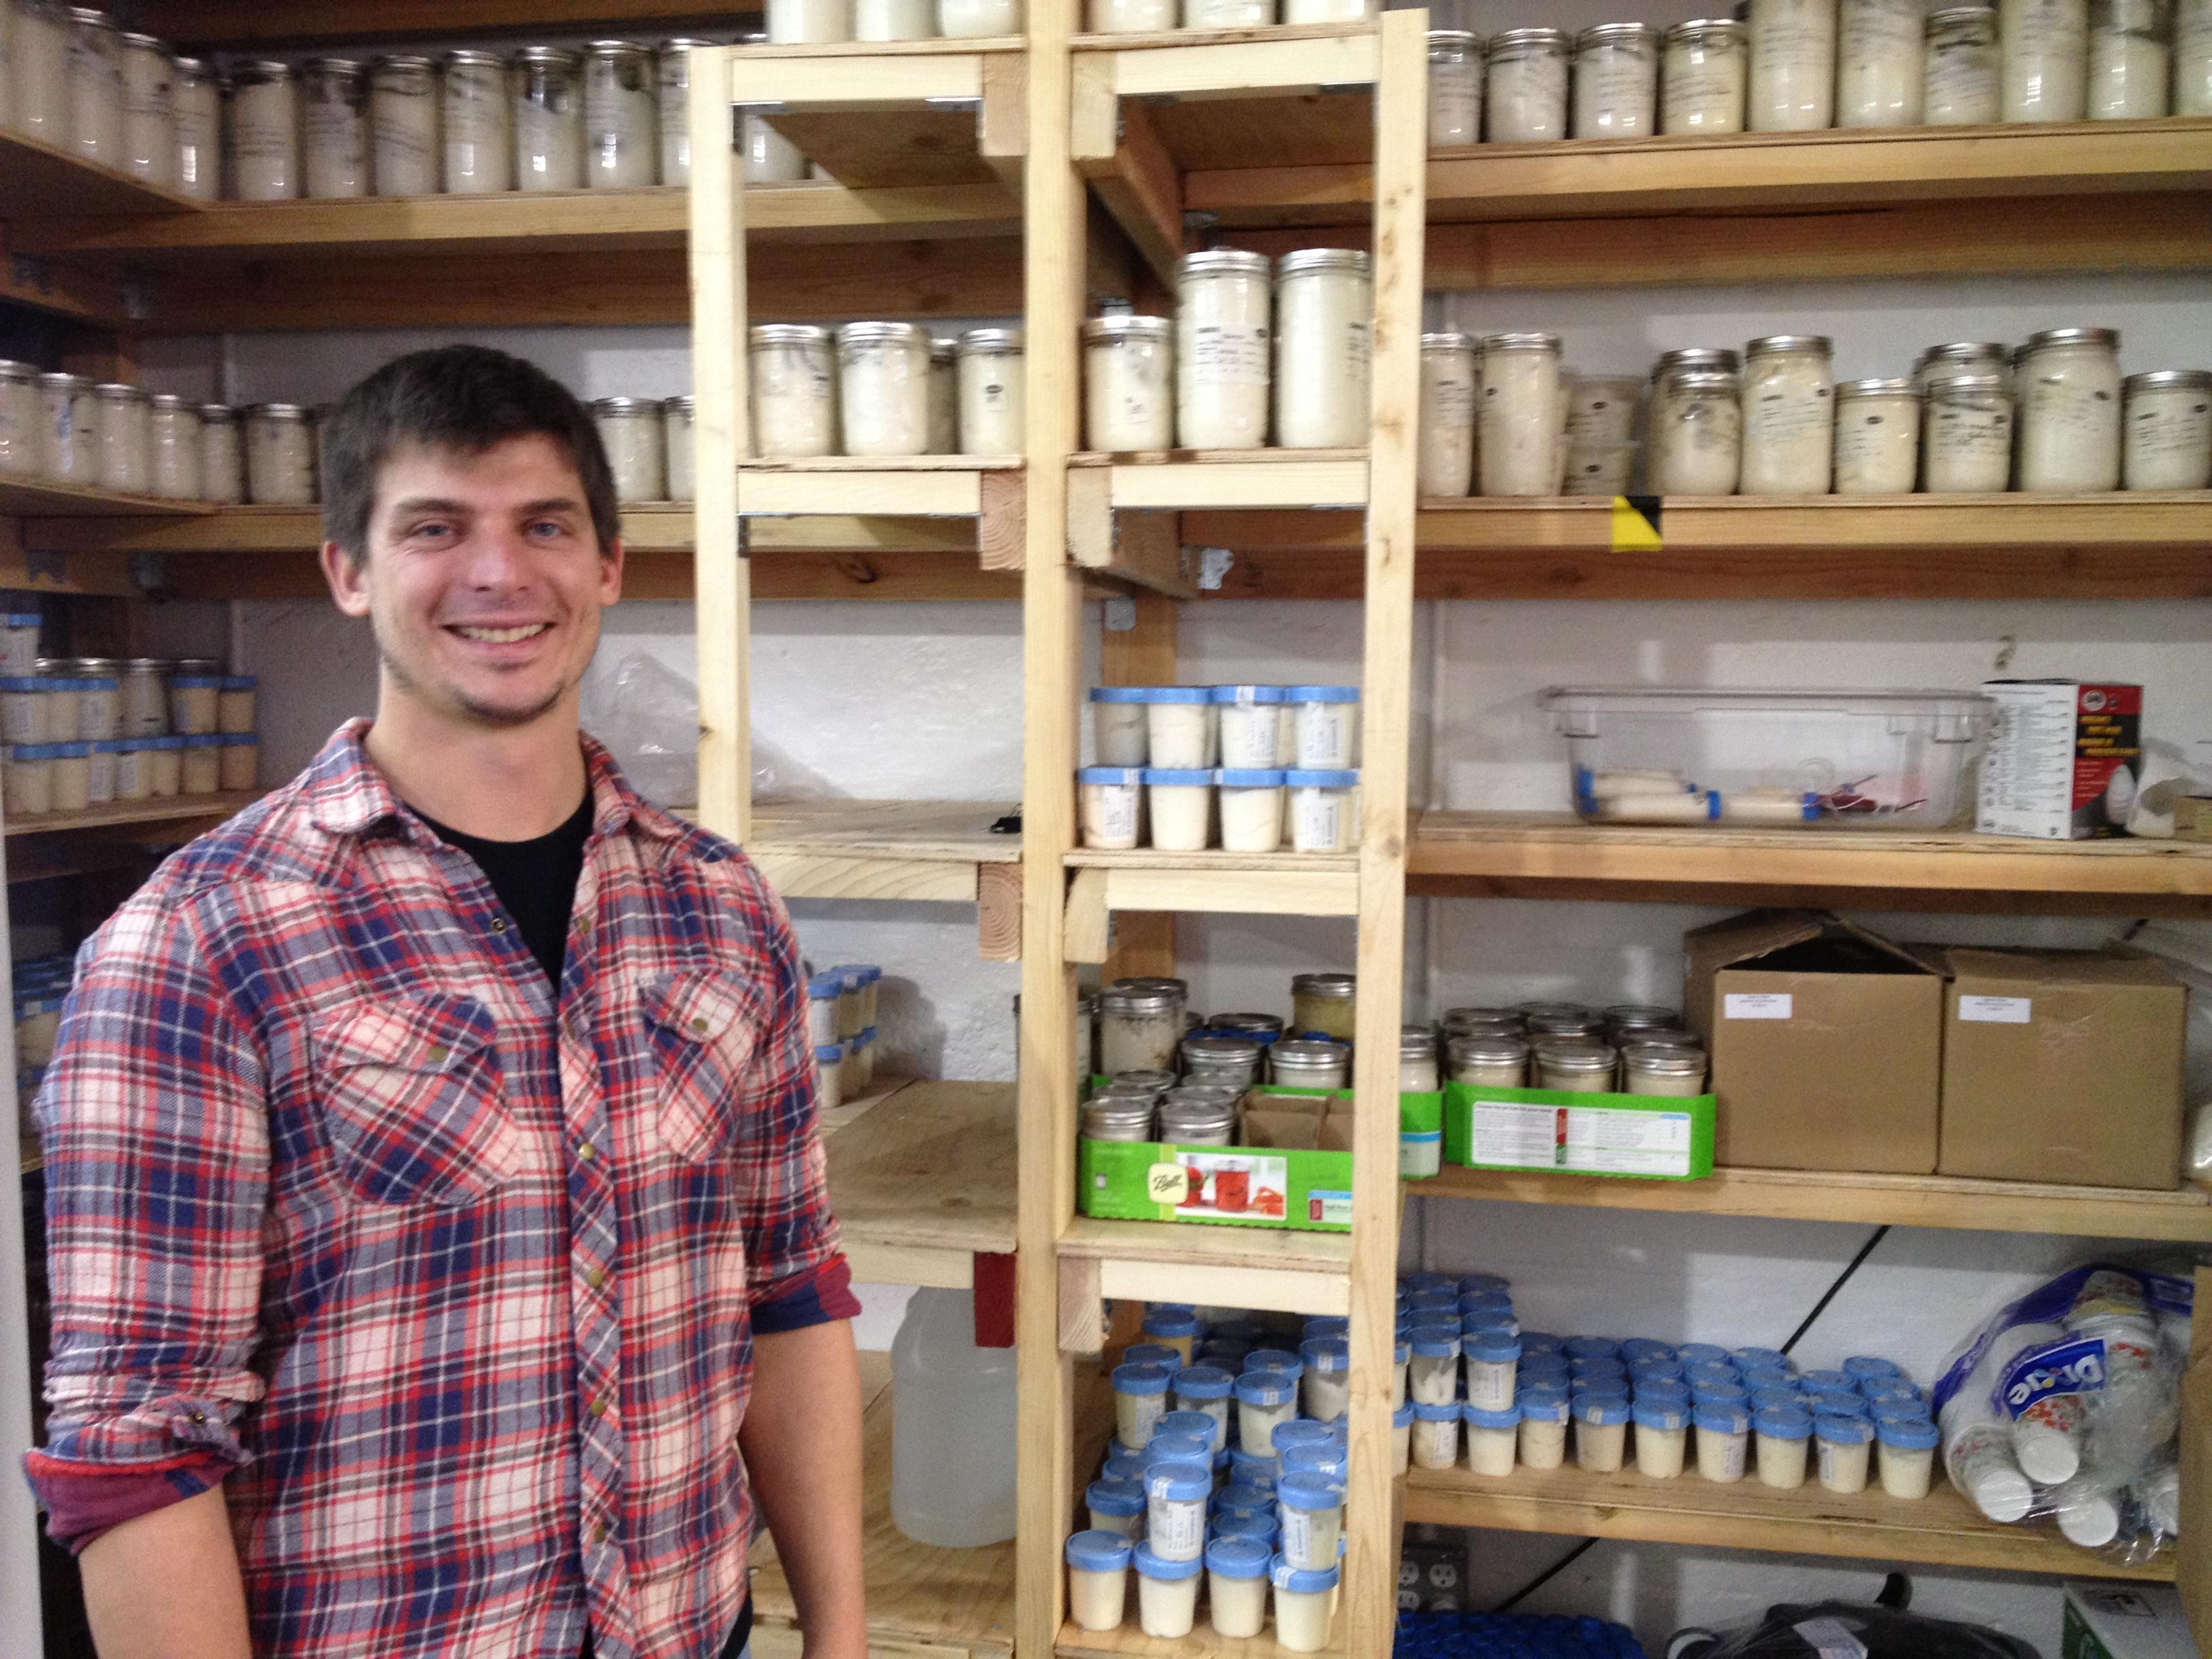 Josh Tetrick, the CEO of Hampton Creek Foods, image courtesy of Gigaom, Katie Fehrenbacher